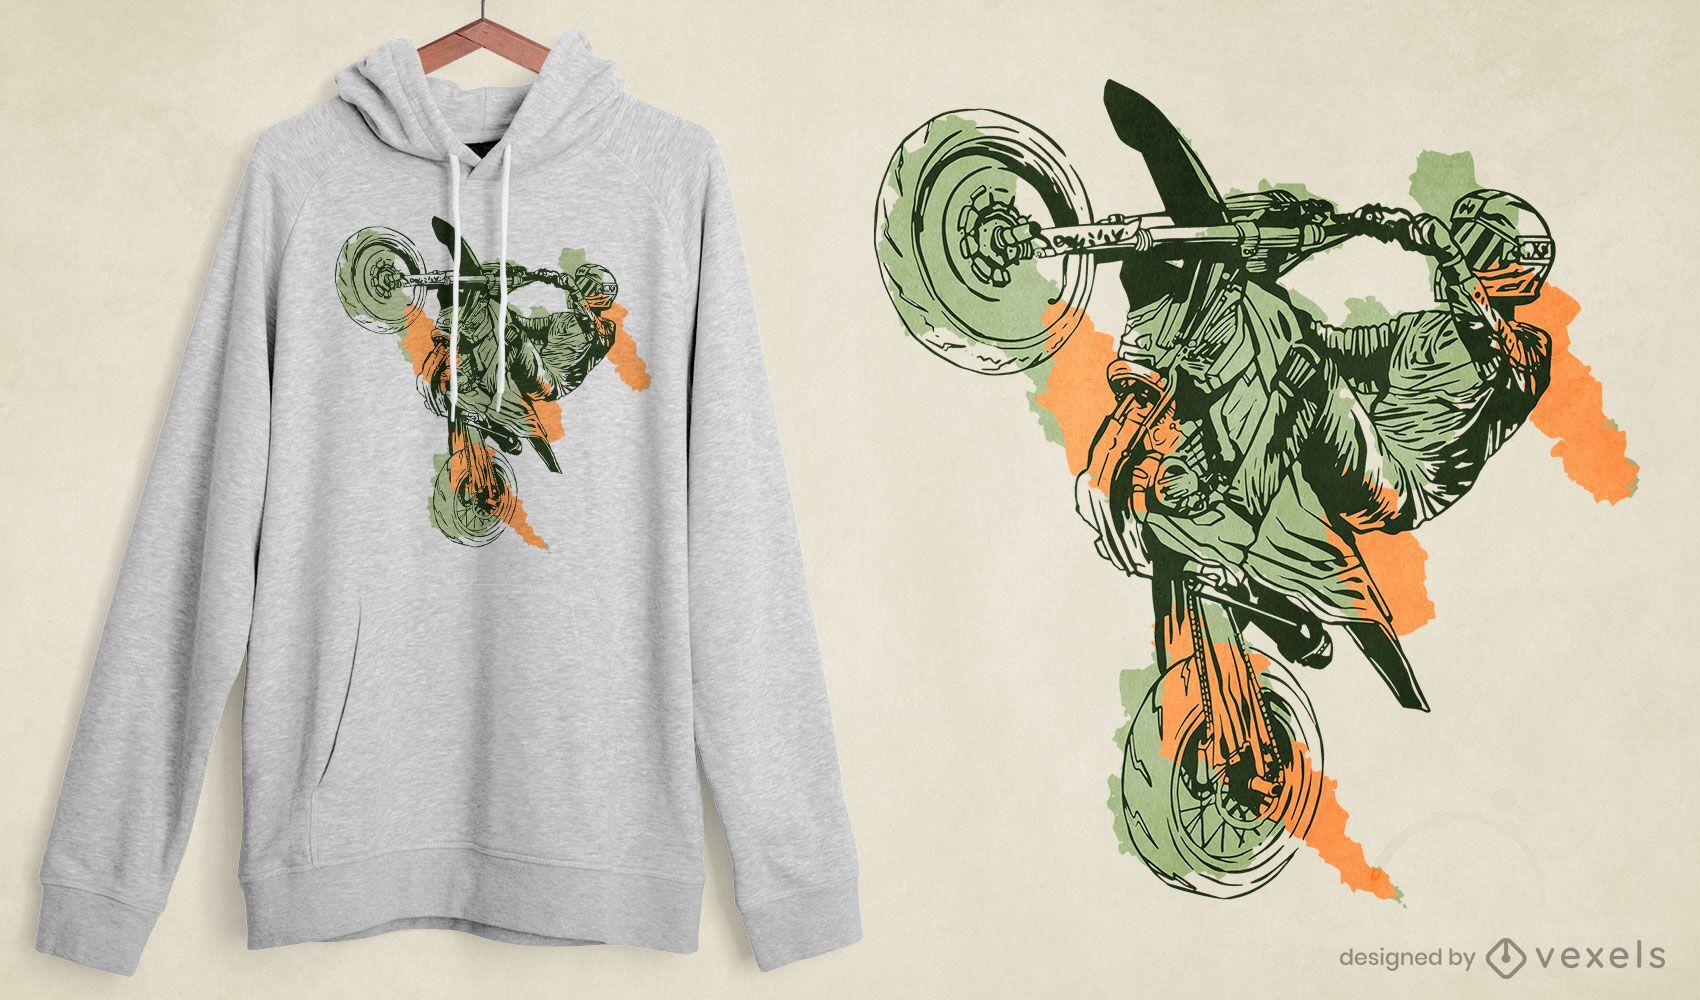 Motorbike stunt t-shirt design